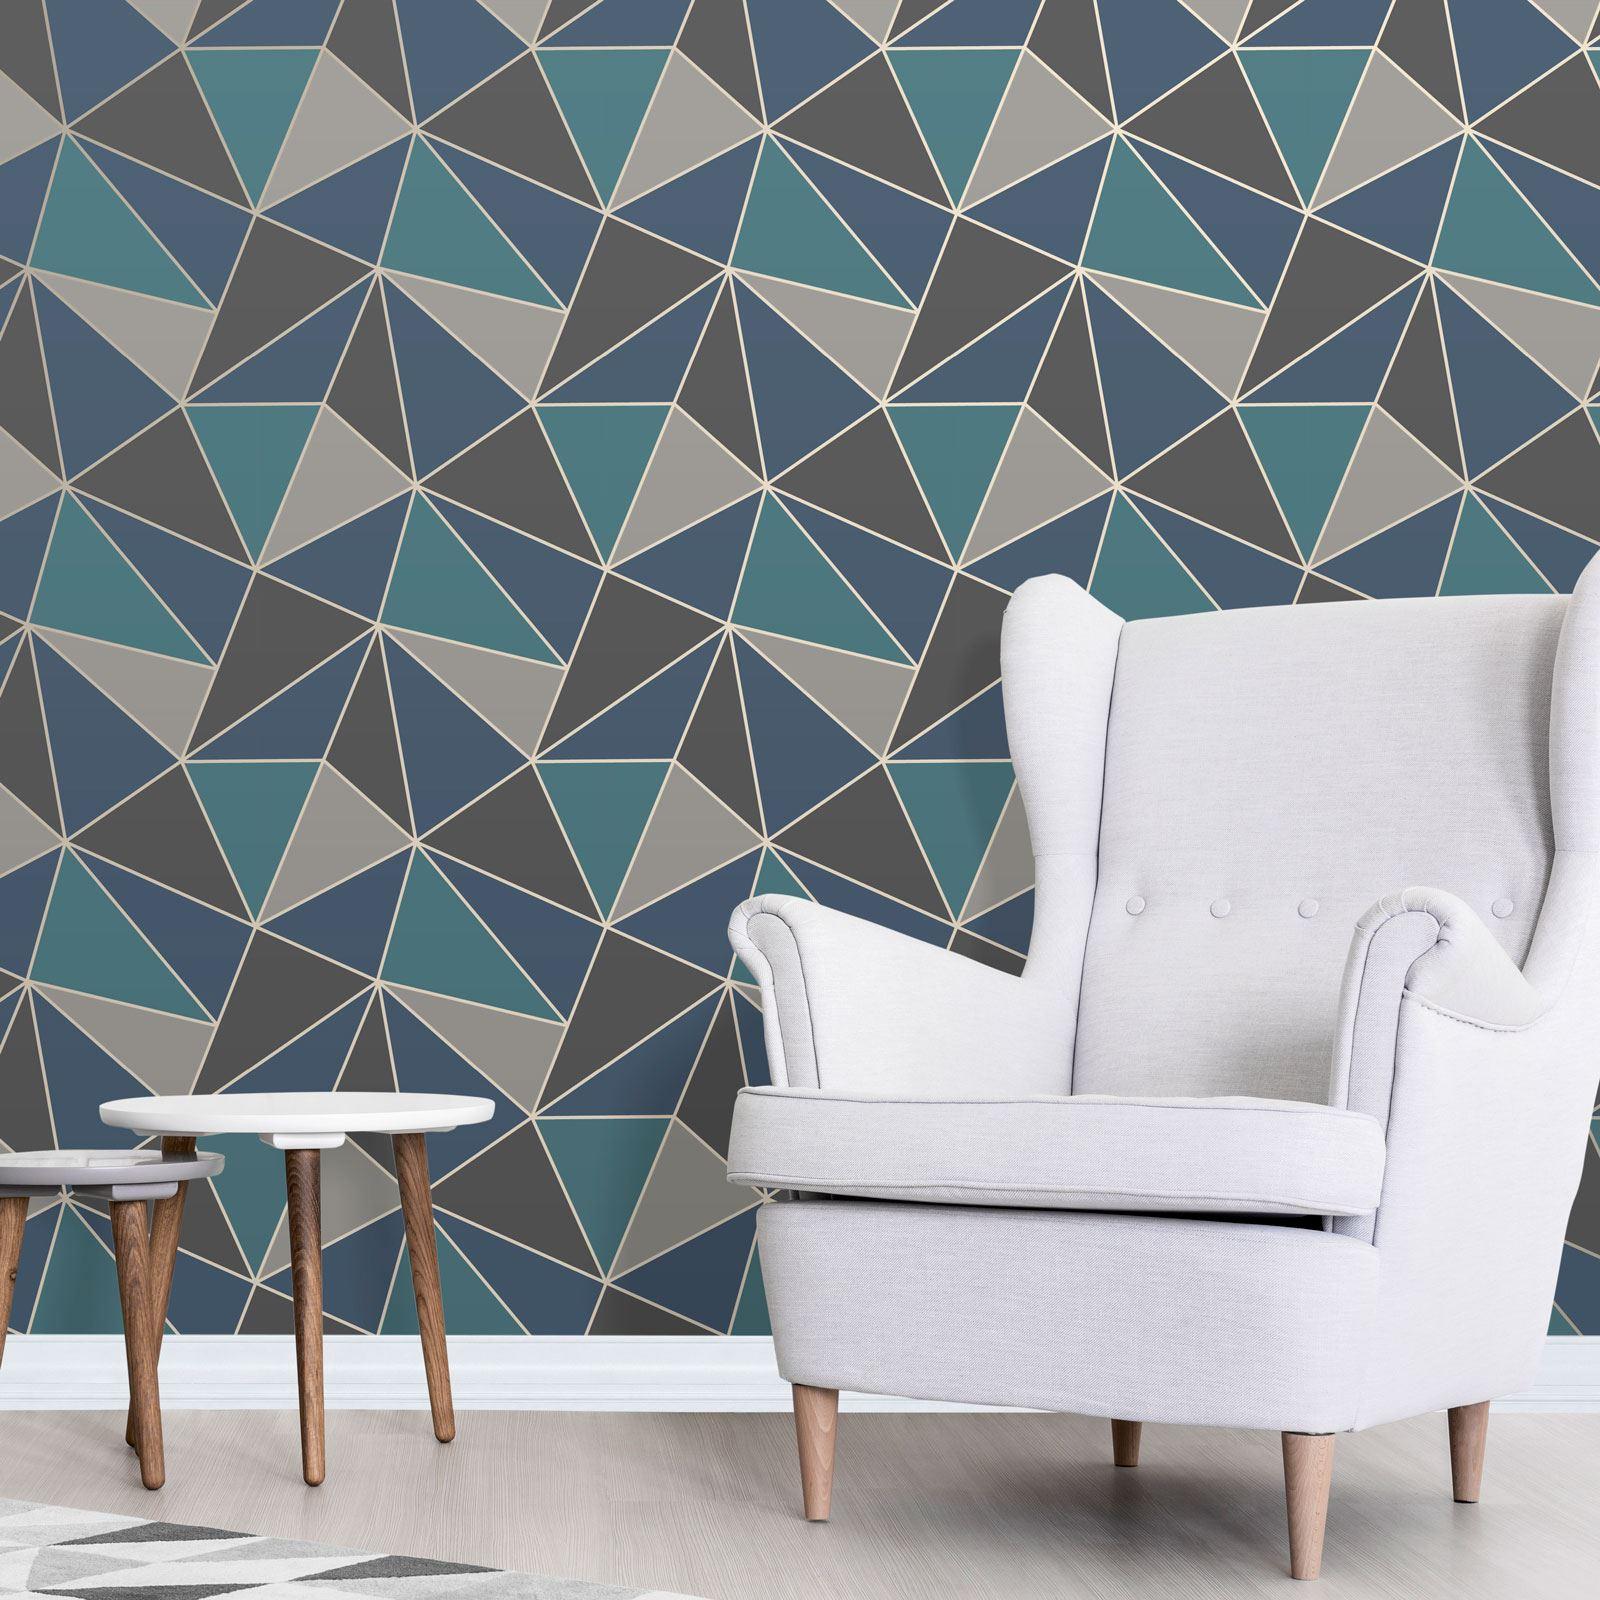 Apex Trellis Sidewall Wallpaper Copper: METALLIC TEXTURED SMOOTH